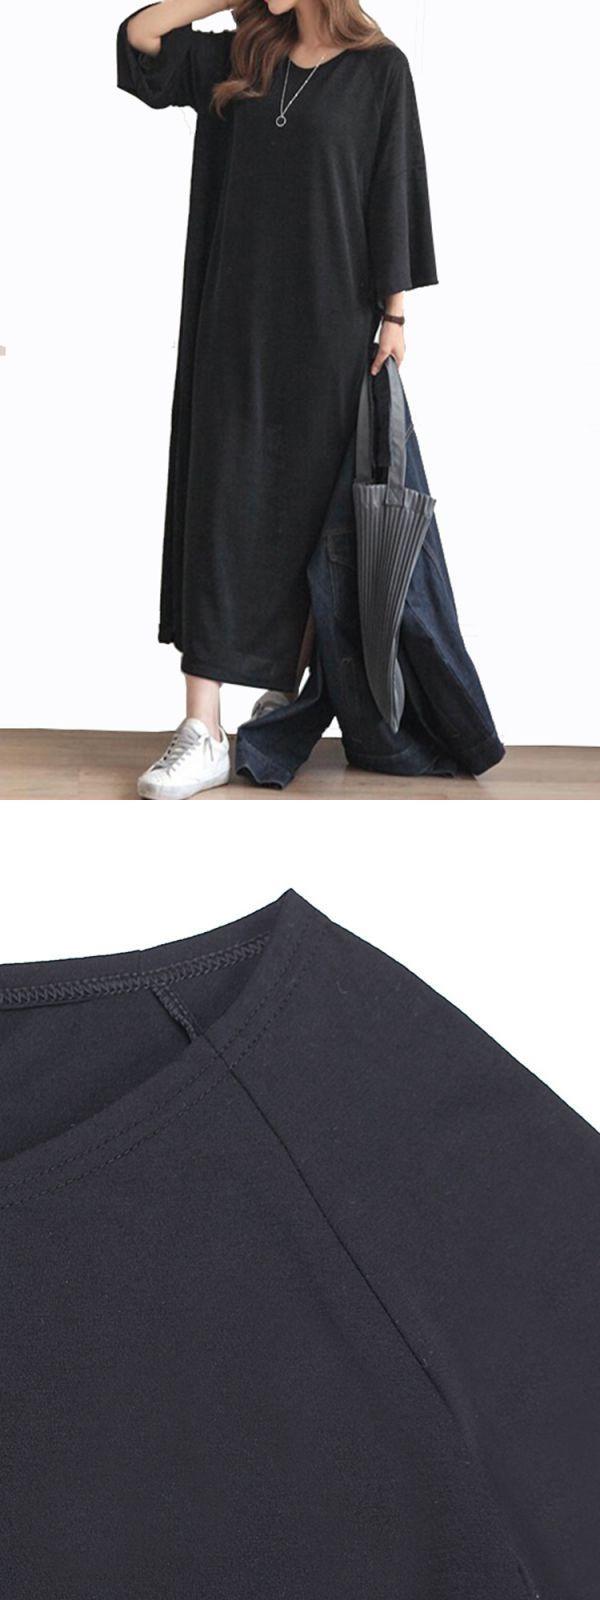 Women casual pure color batwing sleeve side slit loose t-shirt dresses maxi dresses hippie style #3/4th #sleeve #maxi #dresses #maxi #dresses #navy #blue #maxi #dresses #under #$10 #maxi #dresses #under #$50